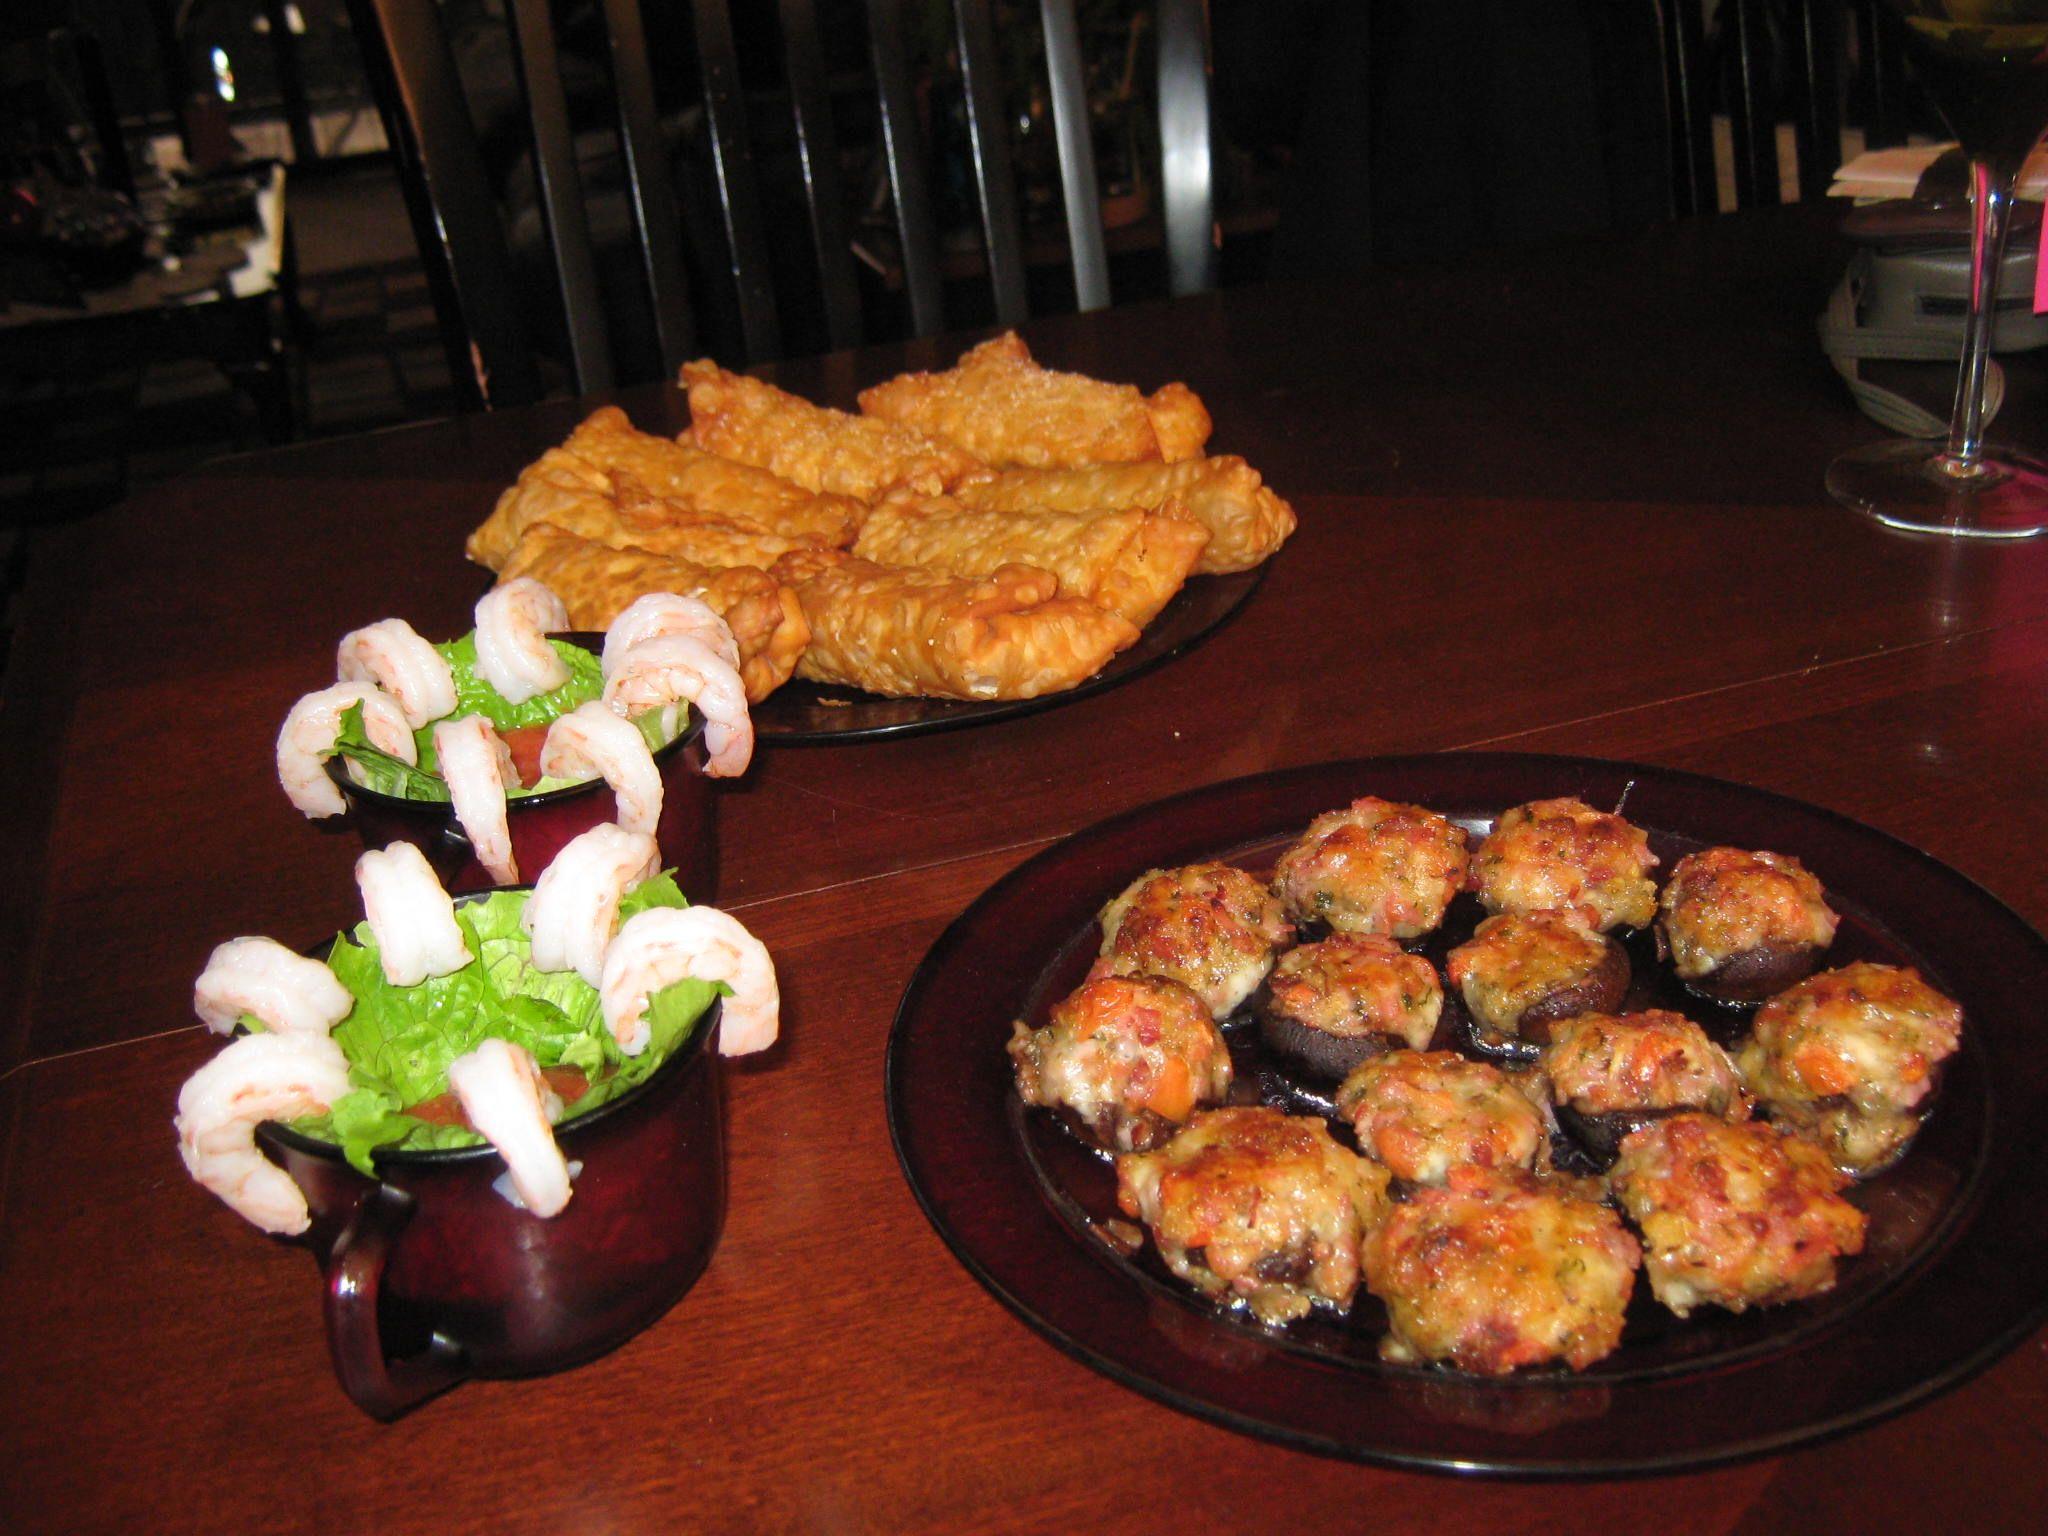 L to R: shrimp cocktail, mini egg rolls and stuffed mushrooms